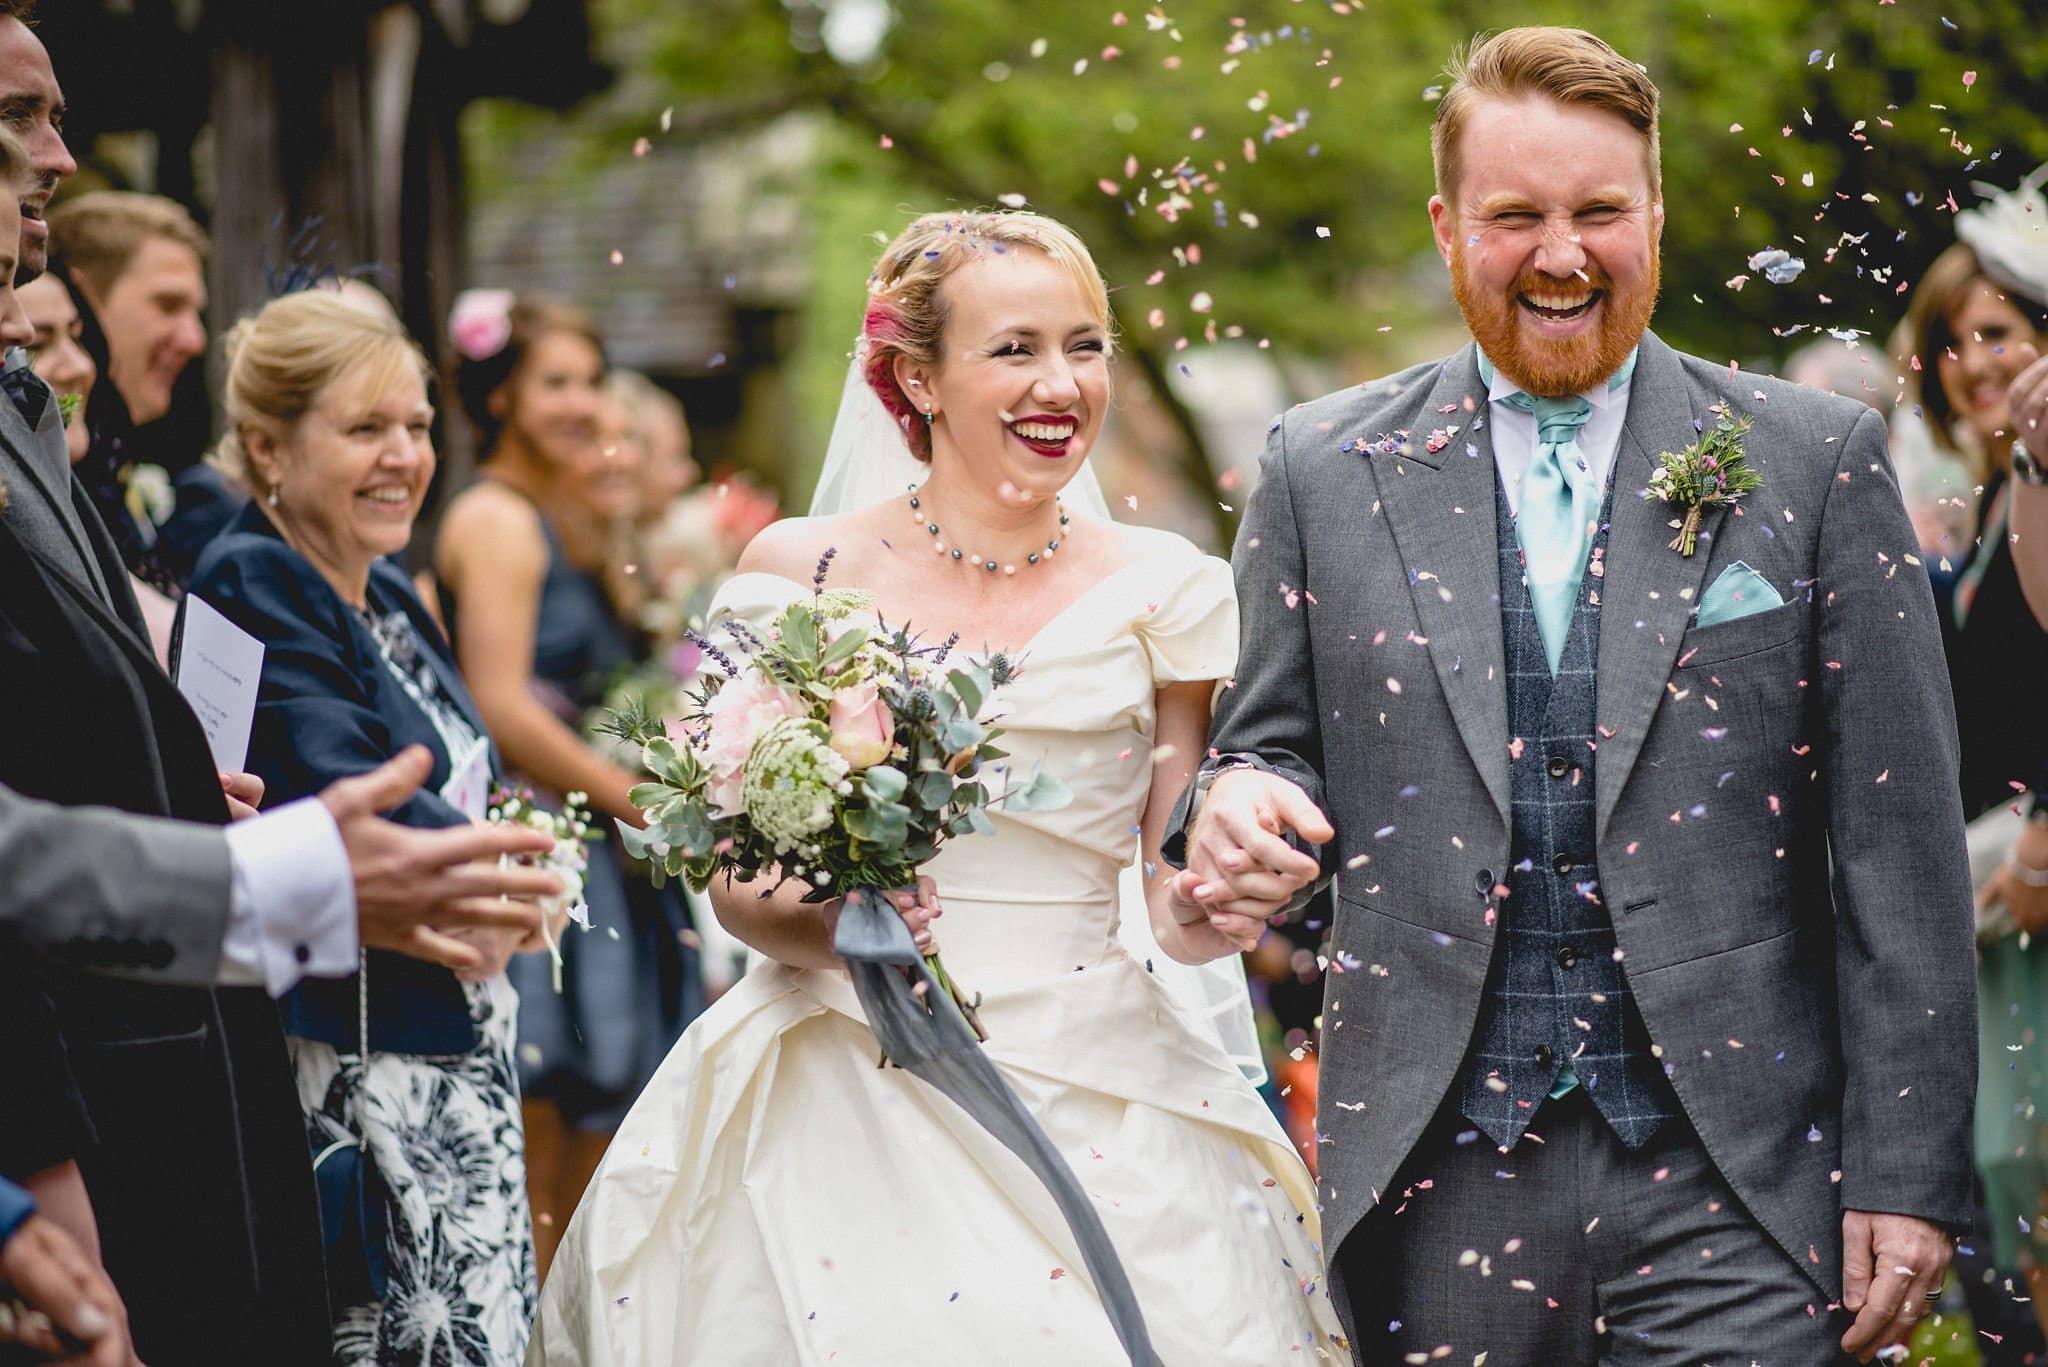 The newlyweds walk through the churchyard in a shower of petal confetti